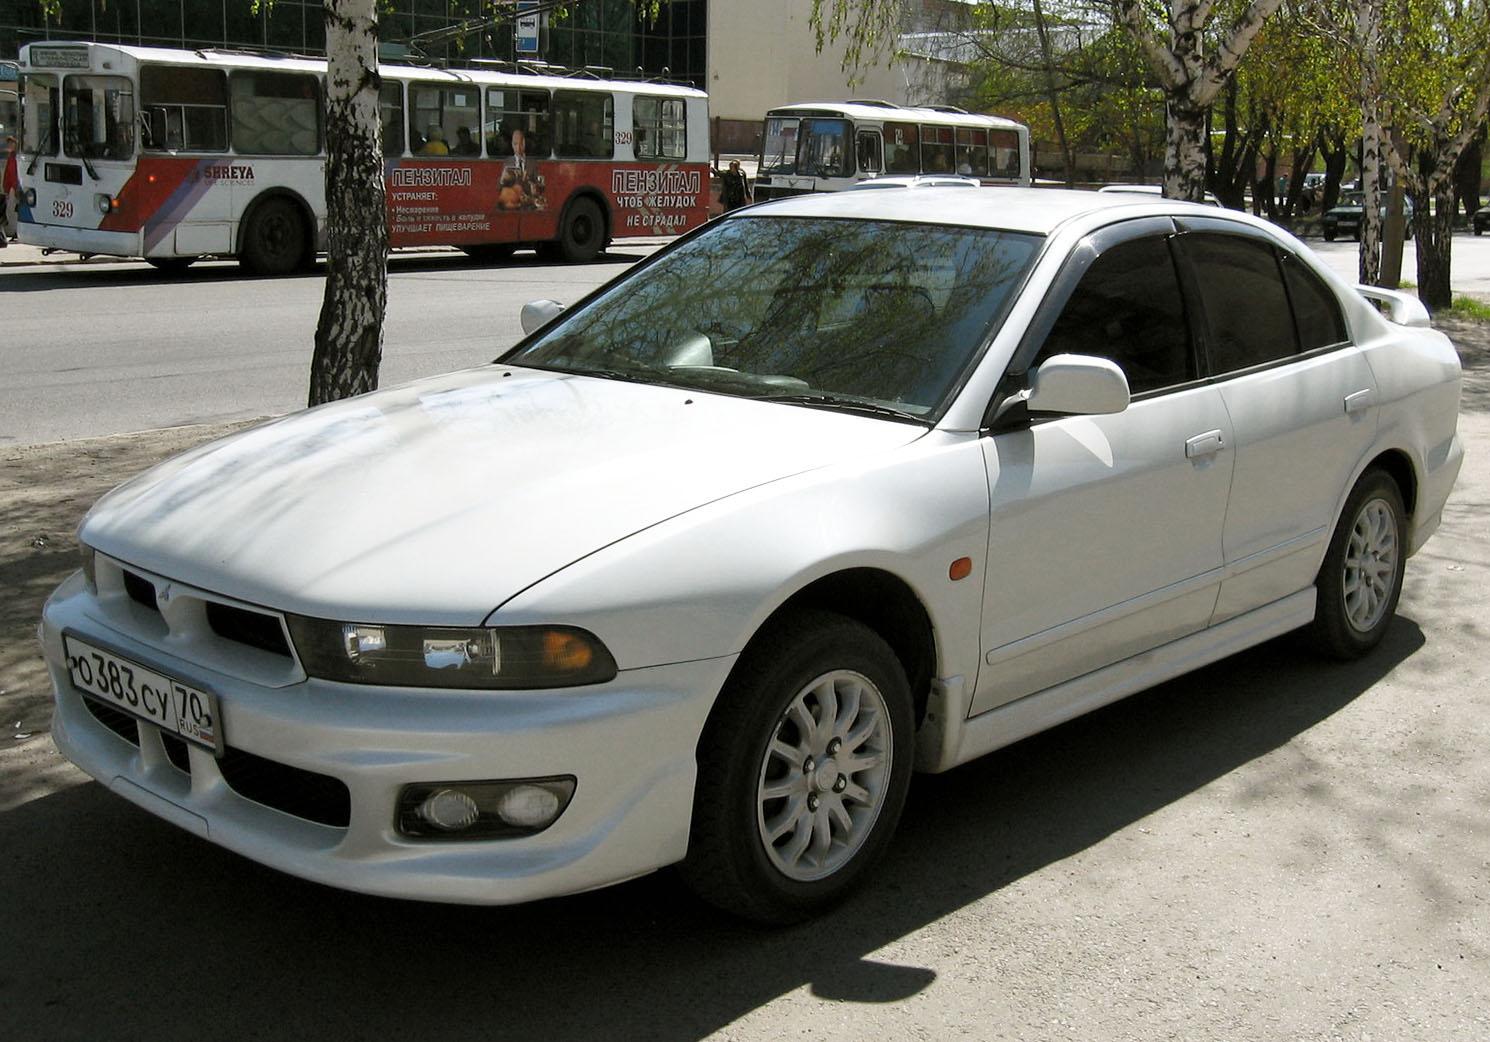 1998 mitsubishi galant es sedan 2 4l manual rh carspecs us 2001 Mitsubishi Galant ES 01 Acura TL Interior